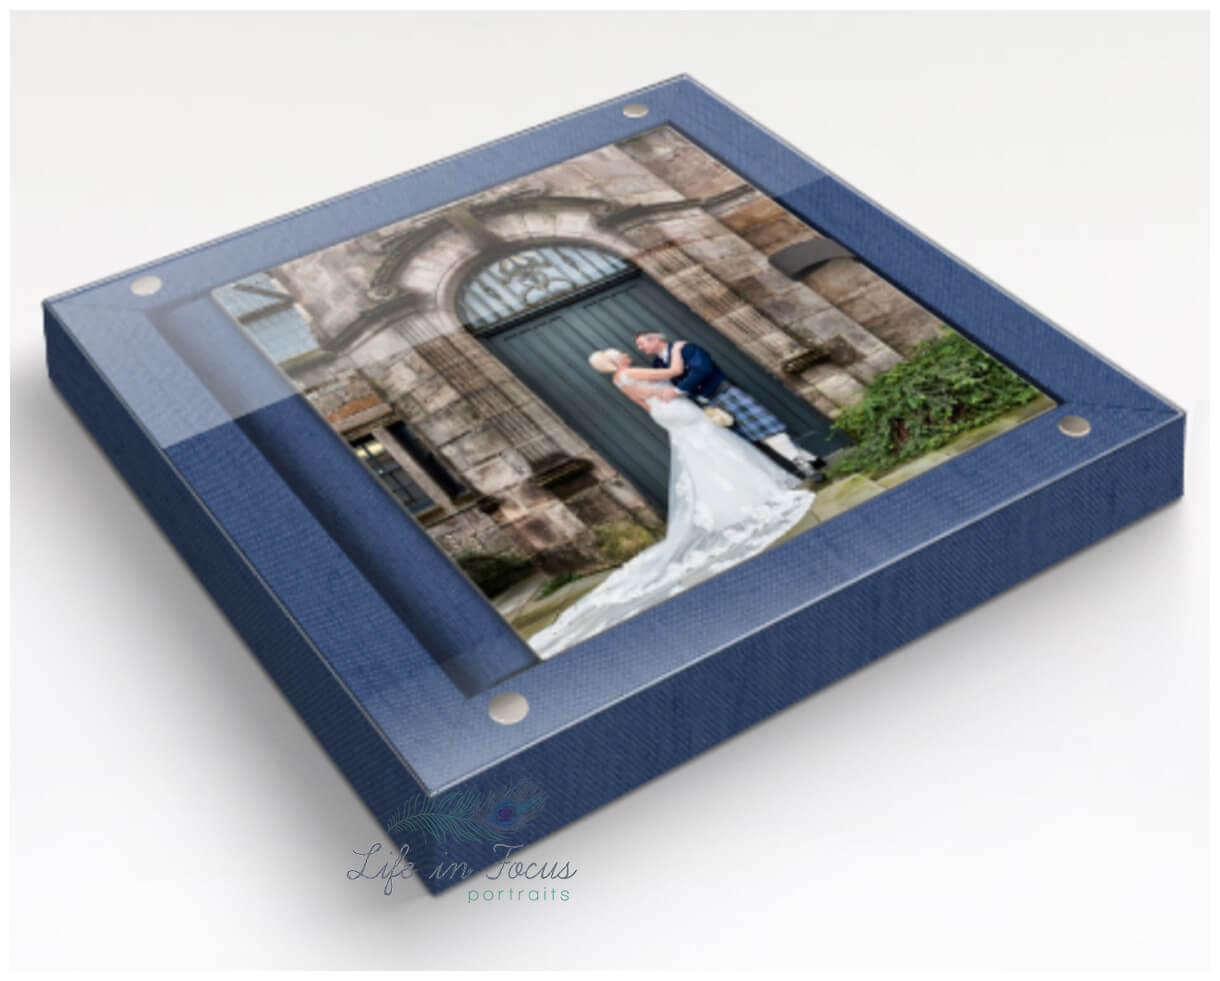 photo of wedding photography album